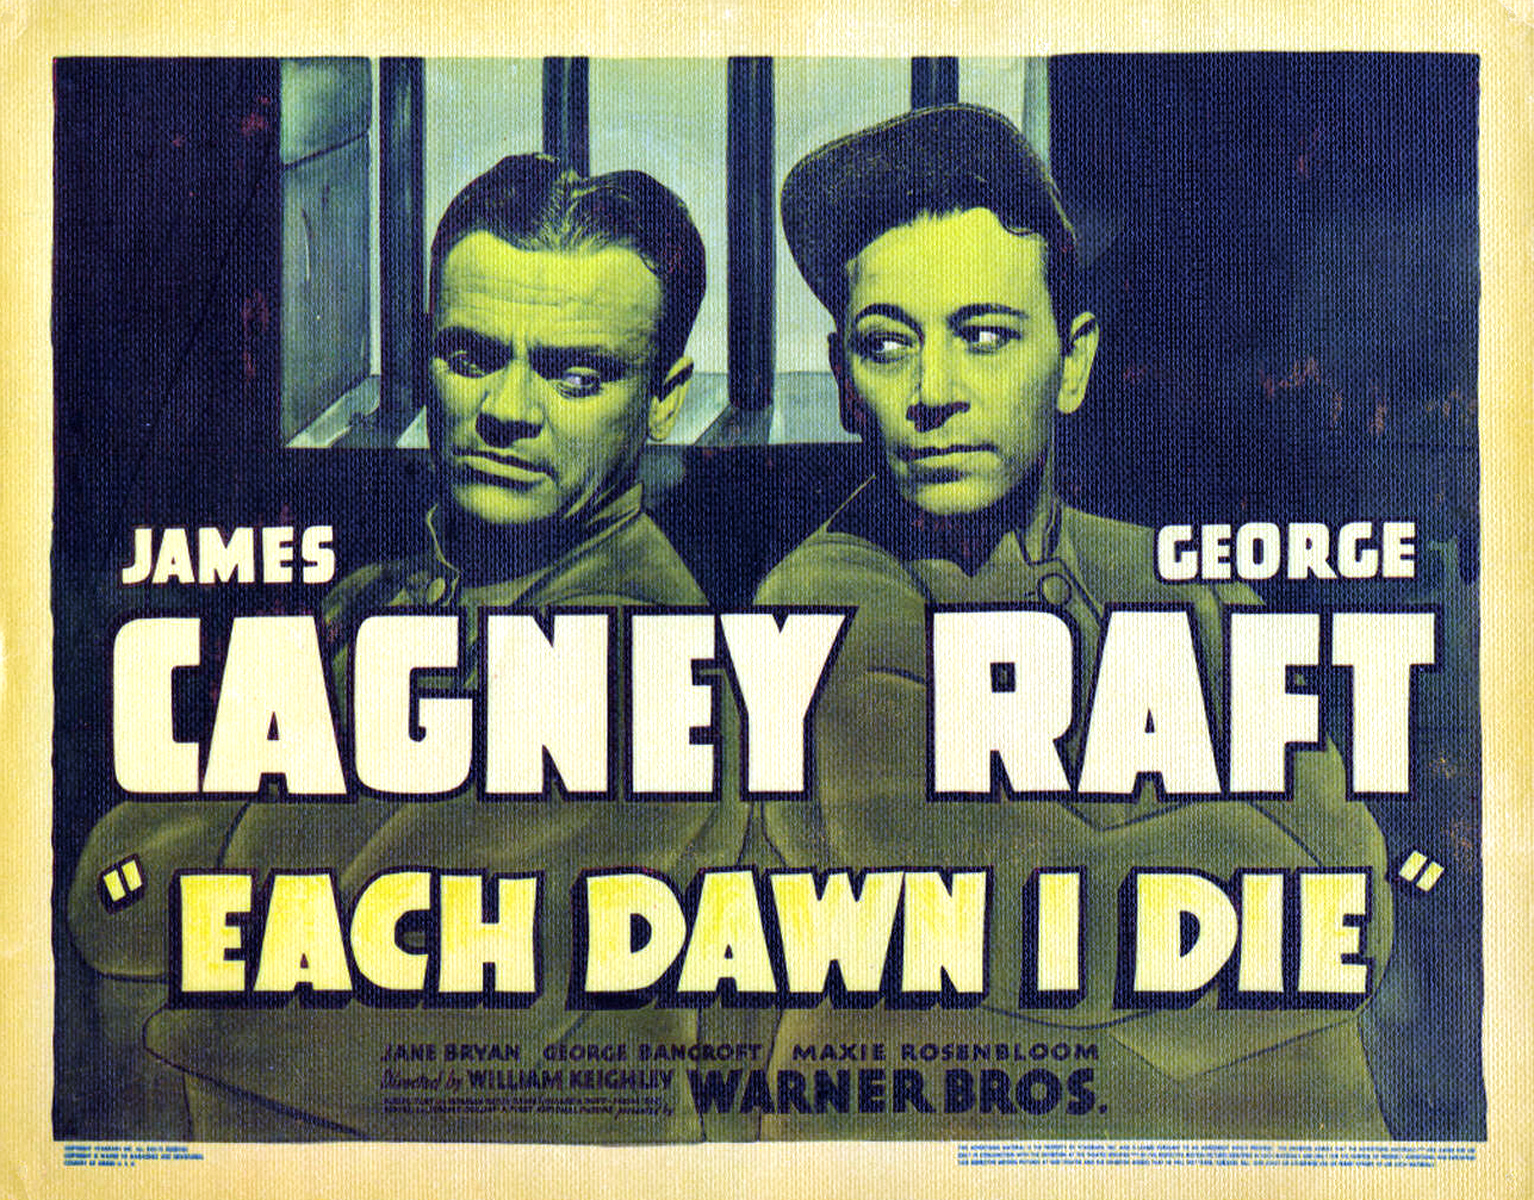 Original-release (1939) lobby card